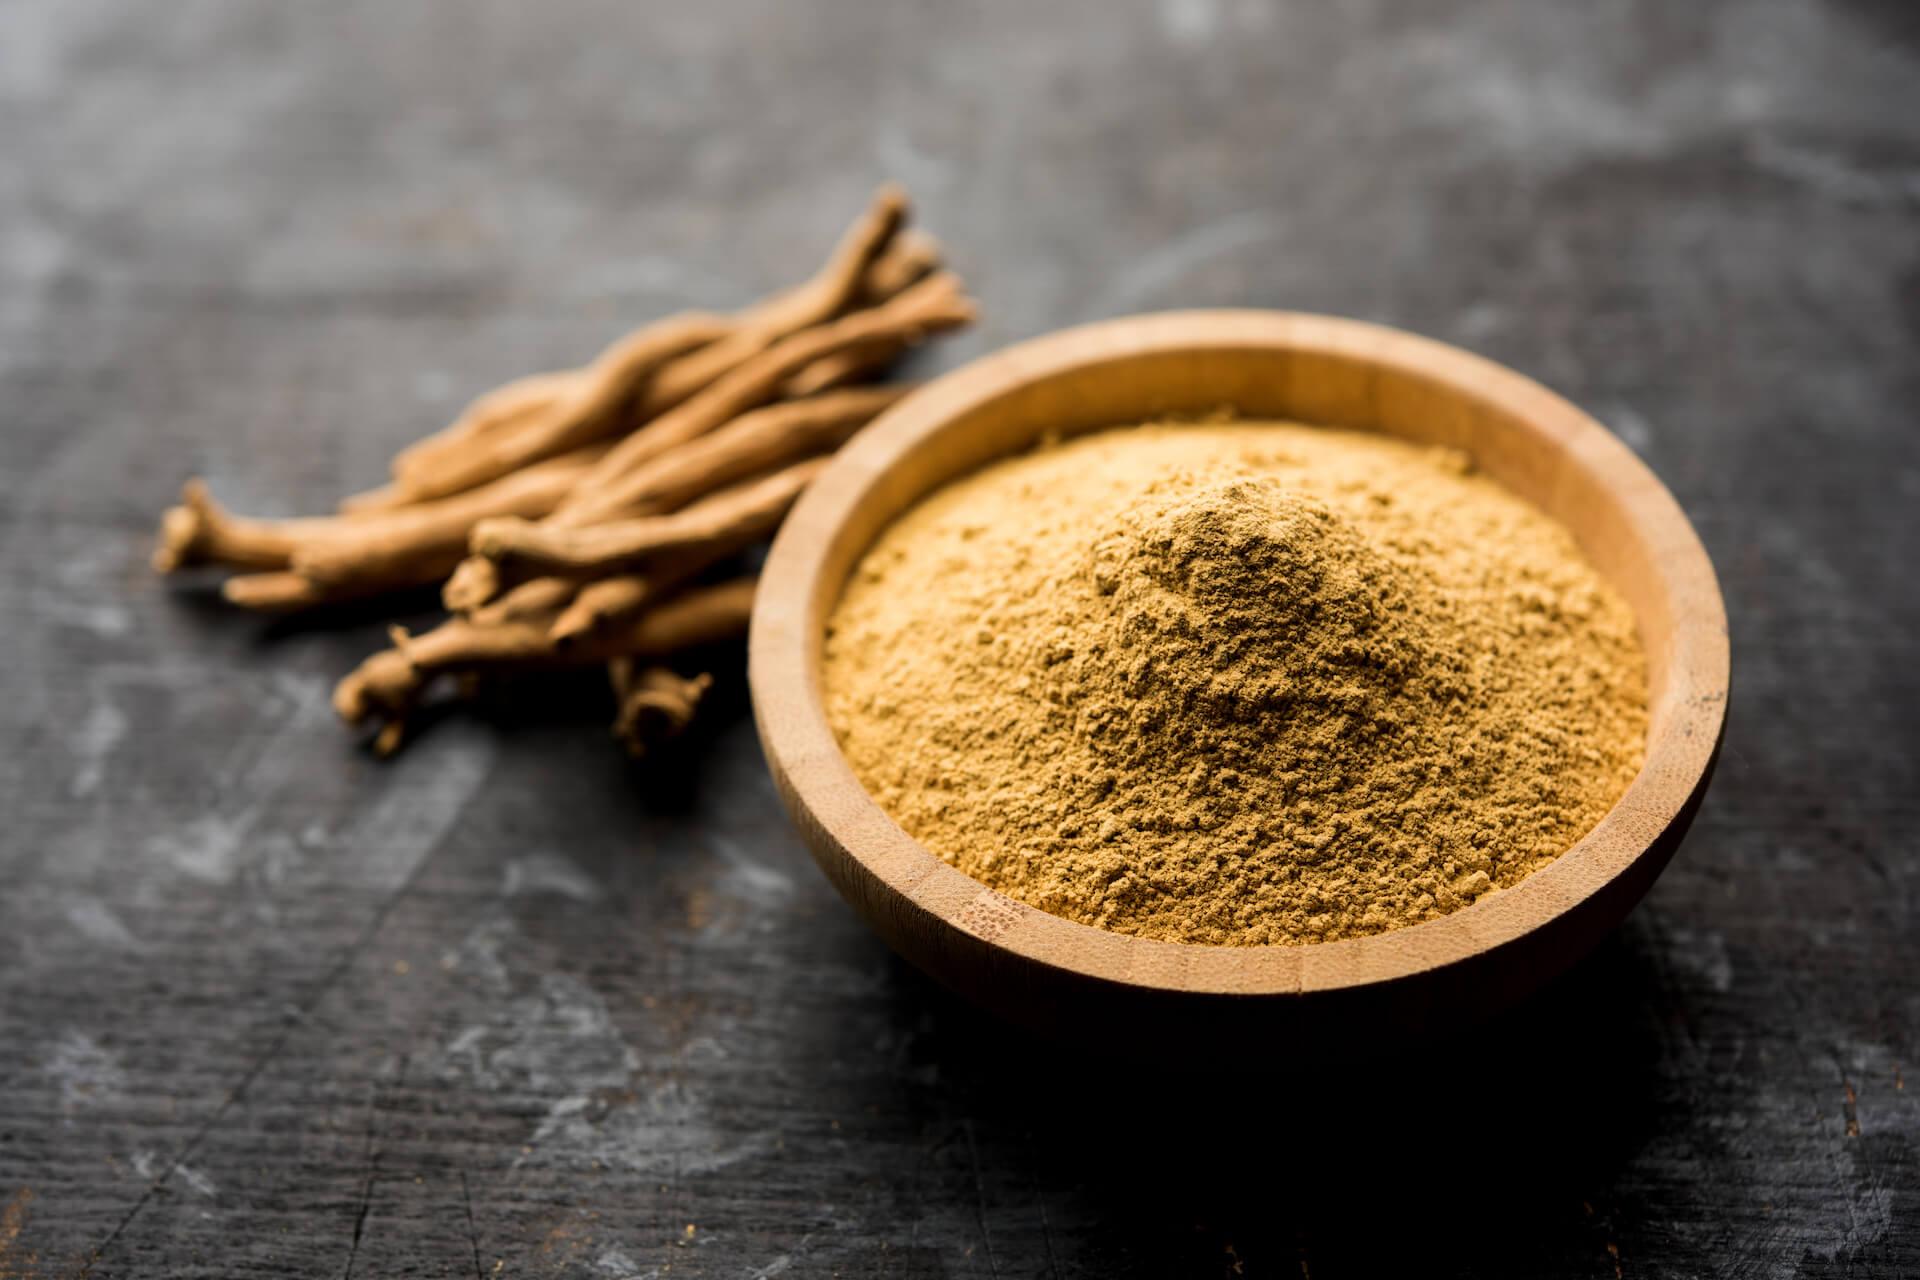 Mljevena ashwaganda u drvenoj zdjelici i suha ashwaganda pored